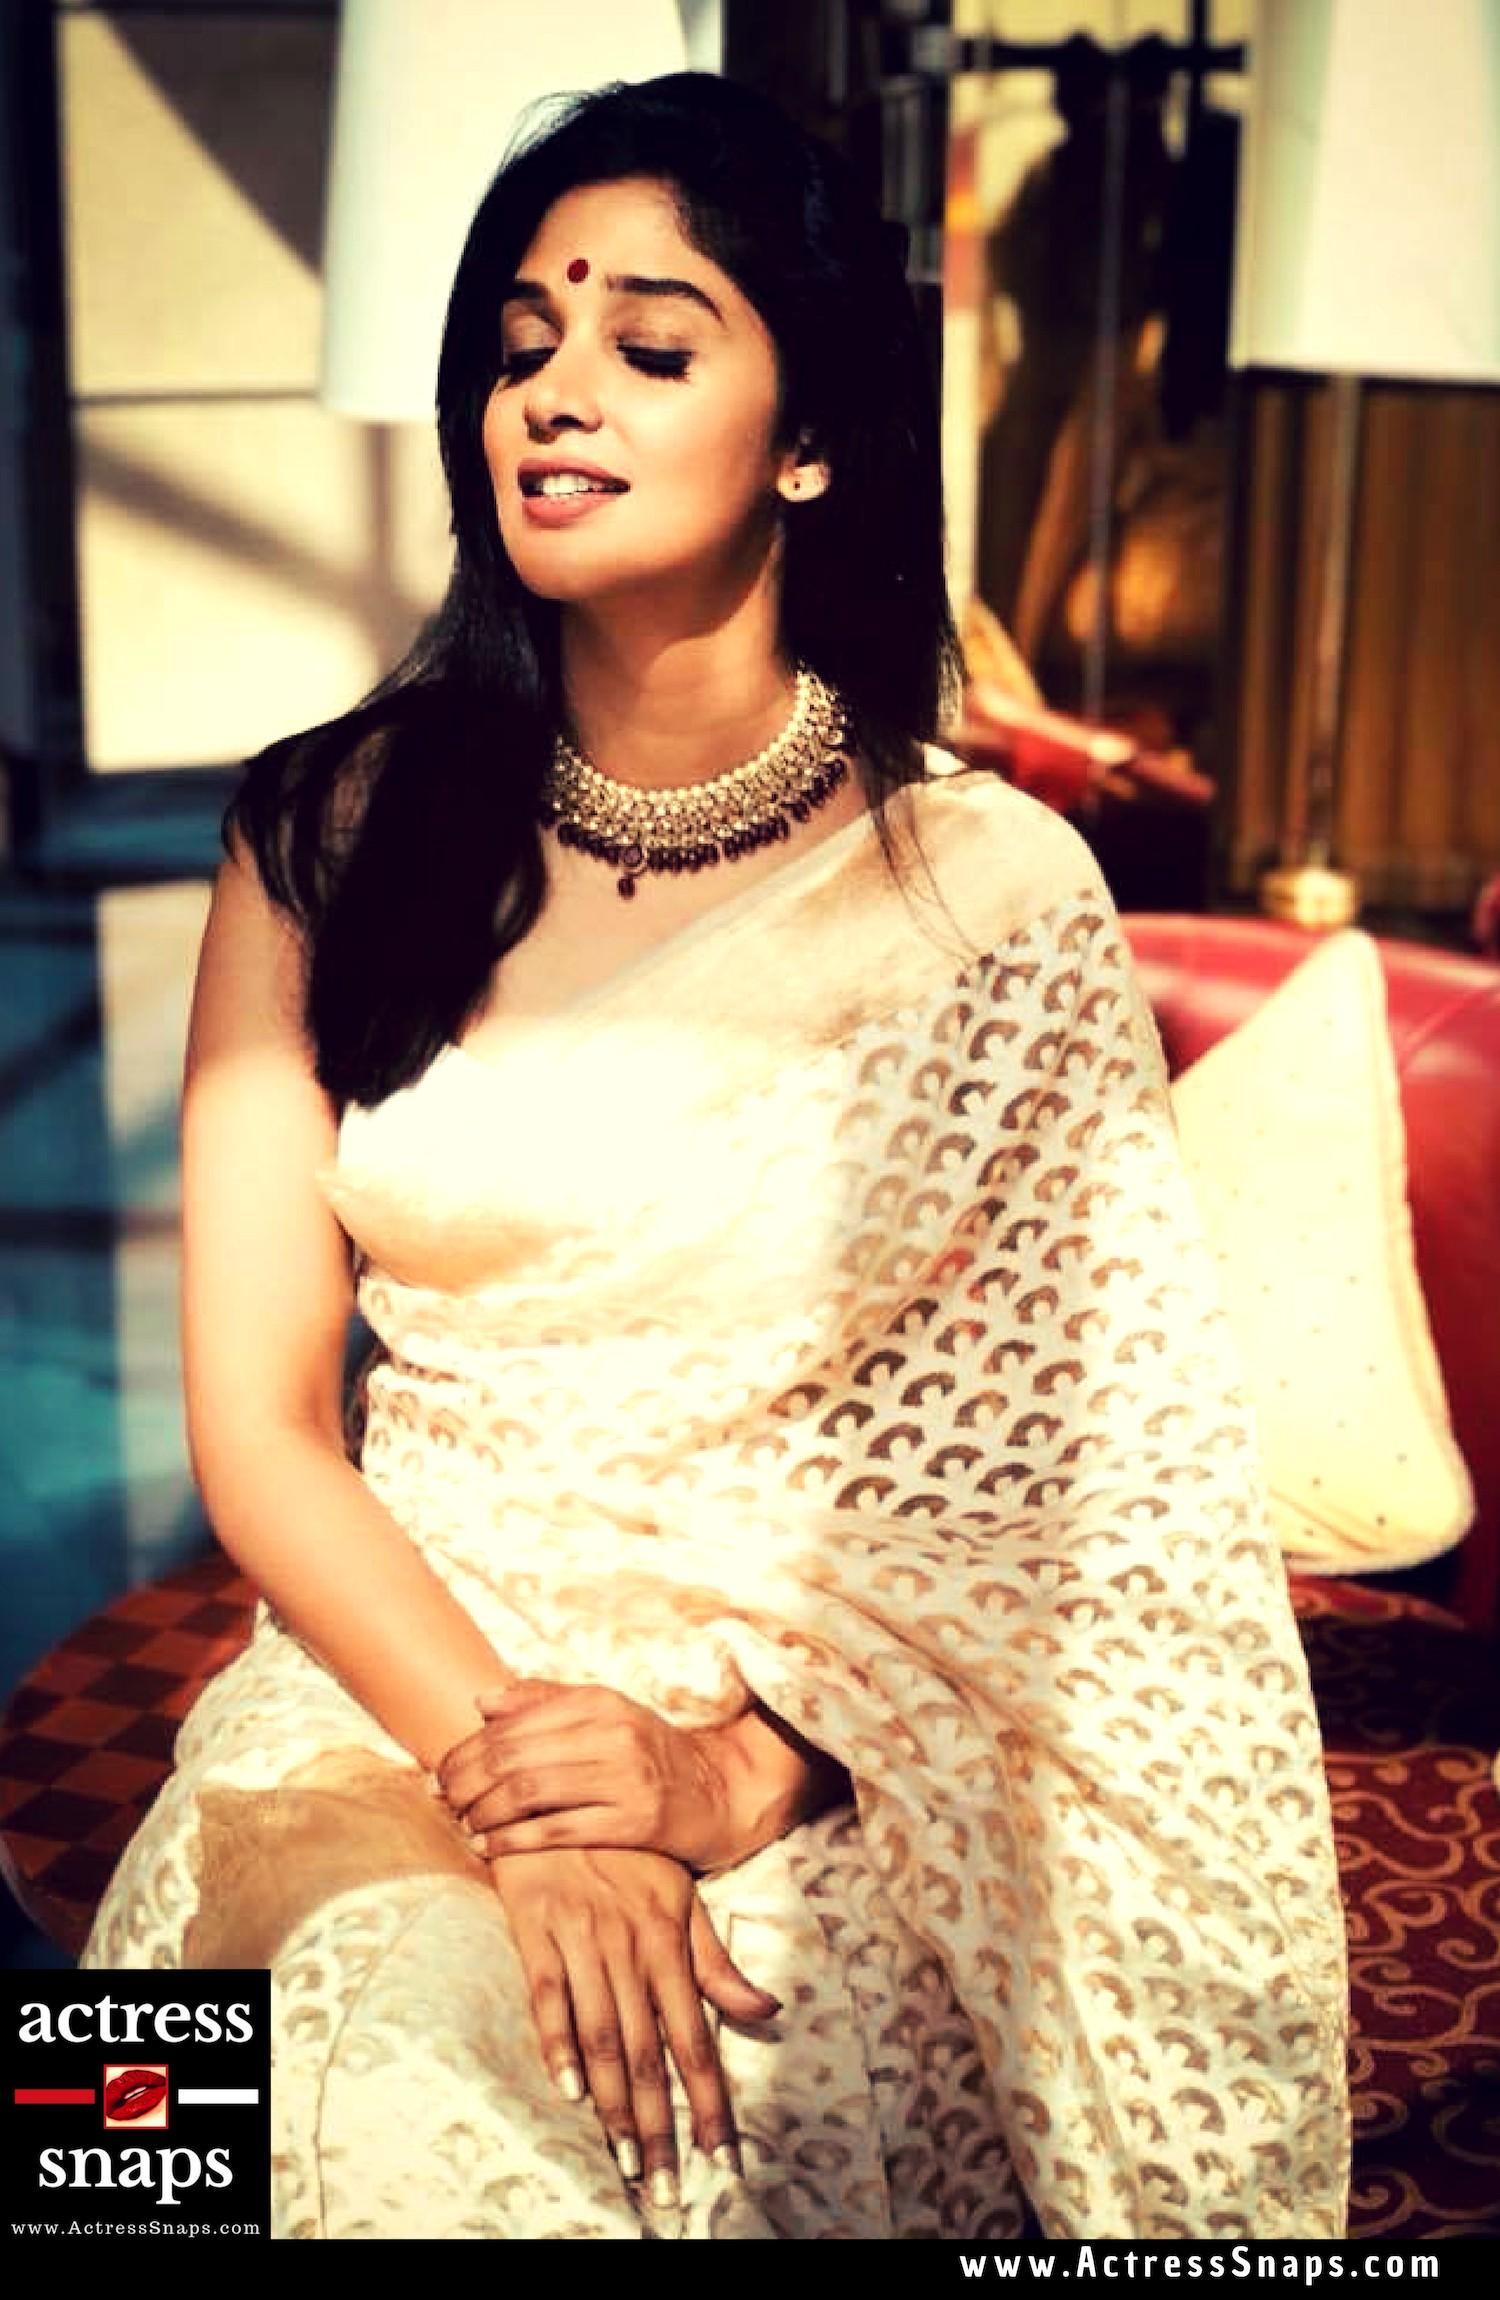 Beautiful Malayalam Actress, Nyla Usha Pictures in Sarees - Sexy Actress Pictures | Hot Actress Pictures - ActressSnaps.com